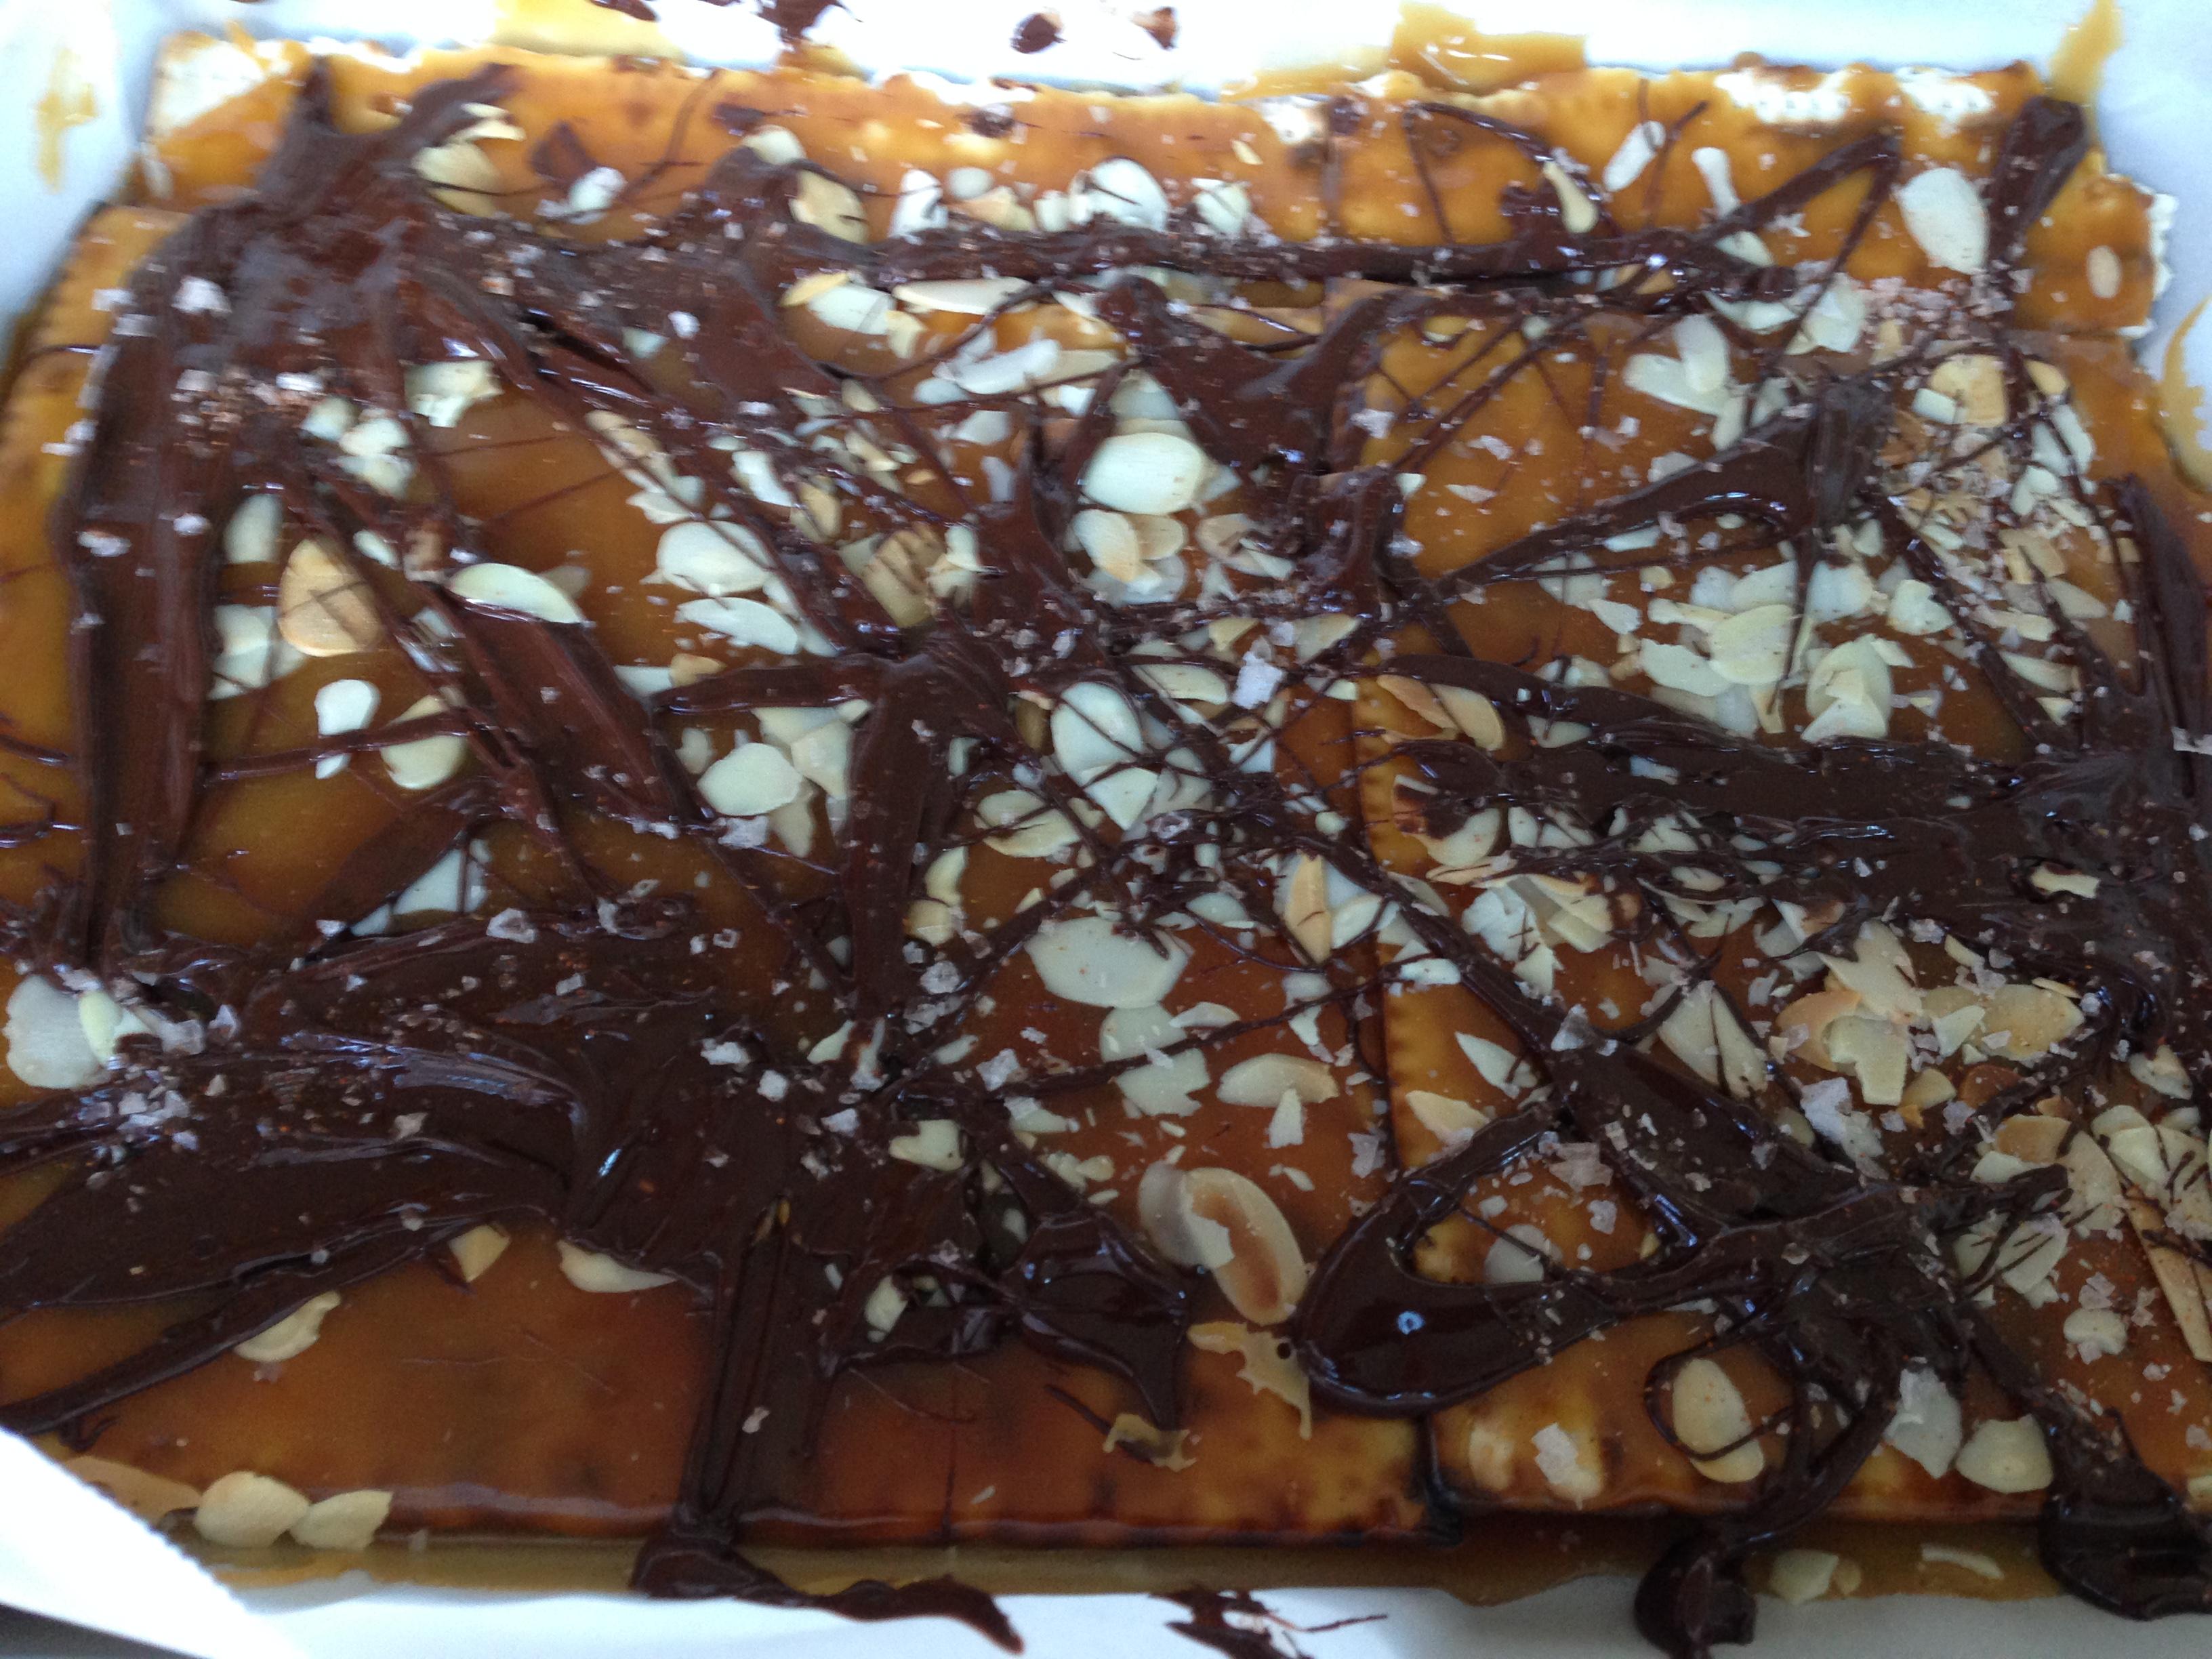 ... matzo almond croccante matzo almond croccante matzo almond croccante